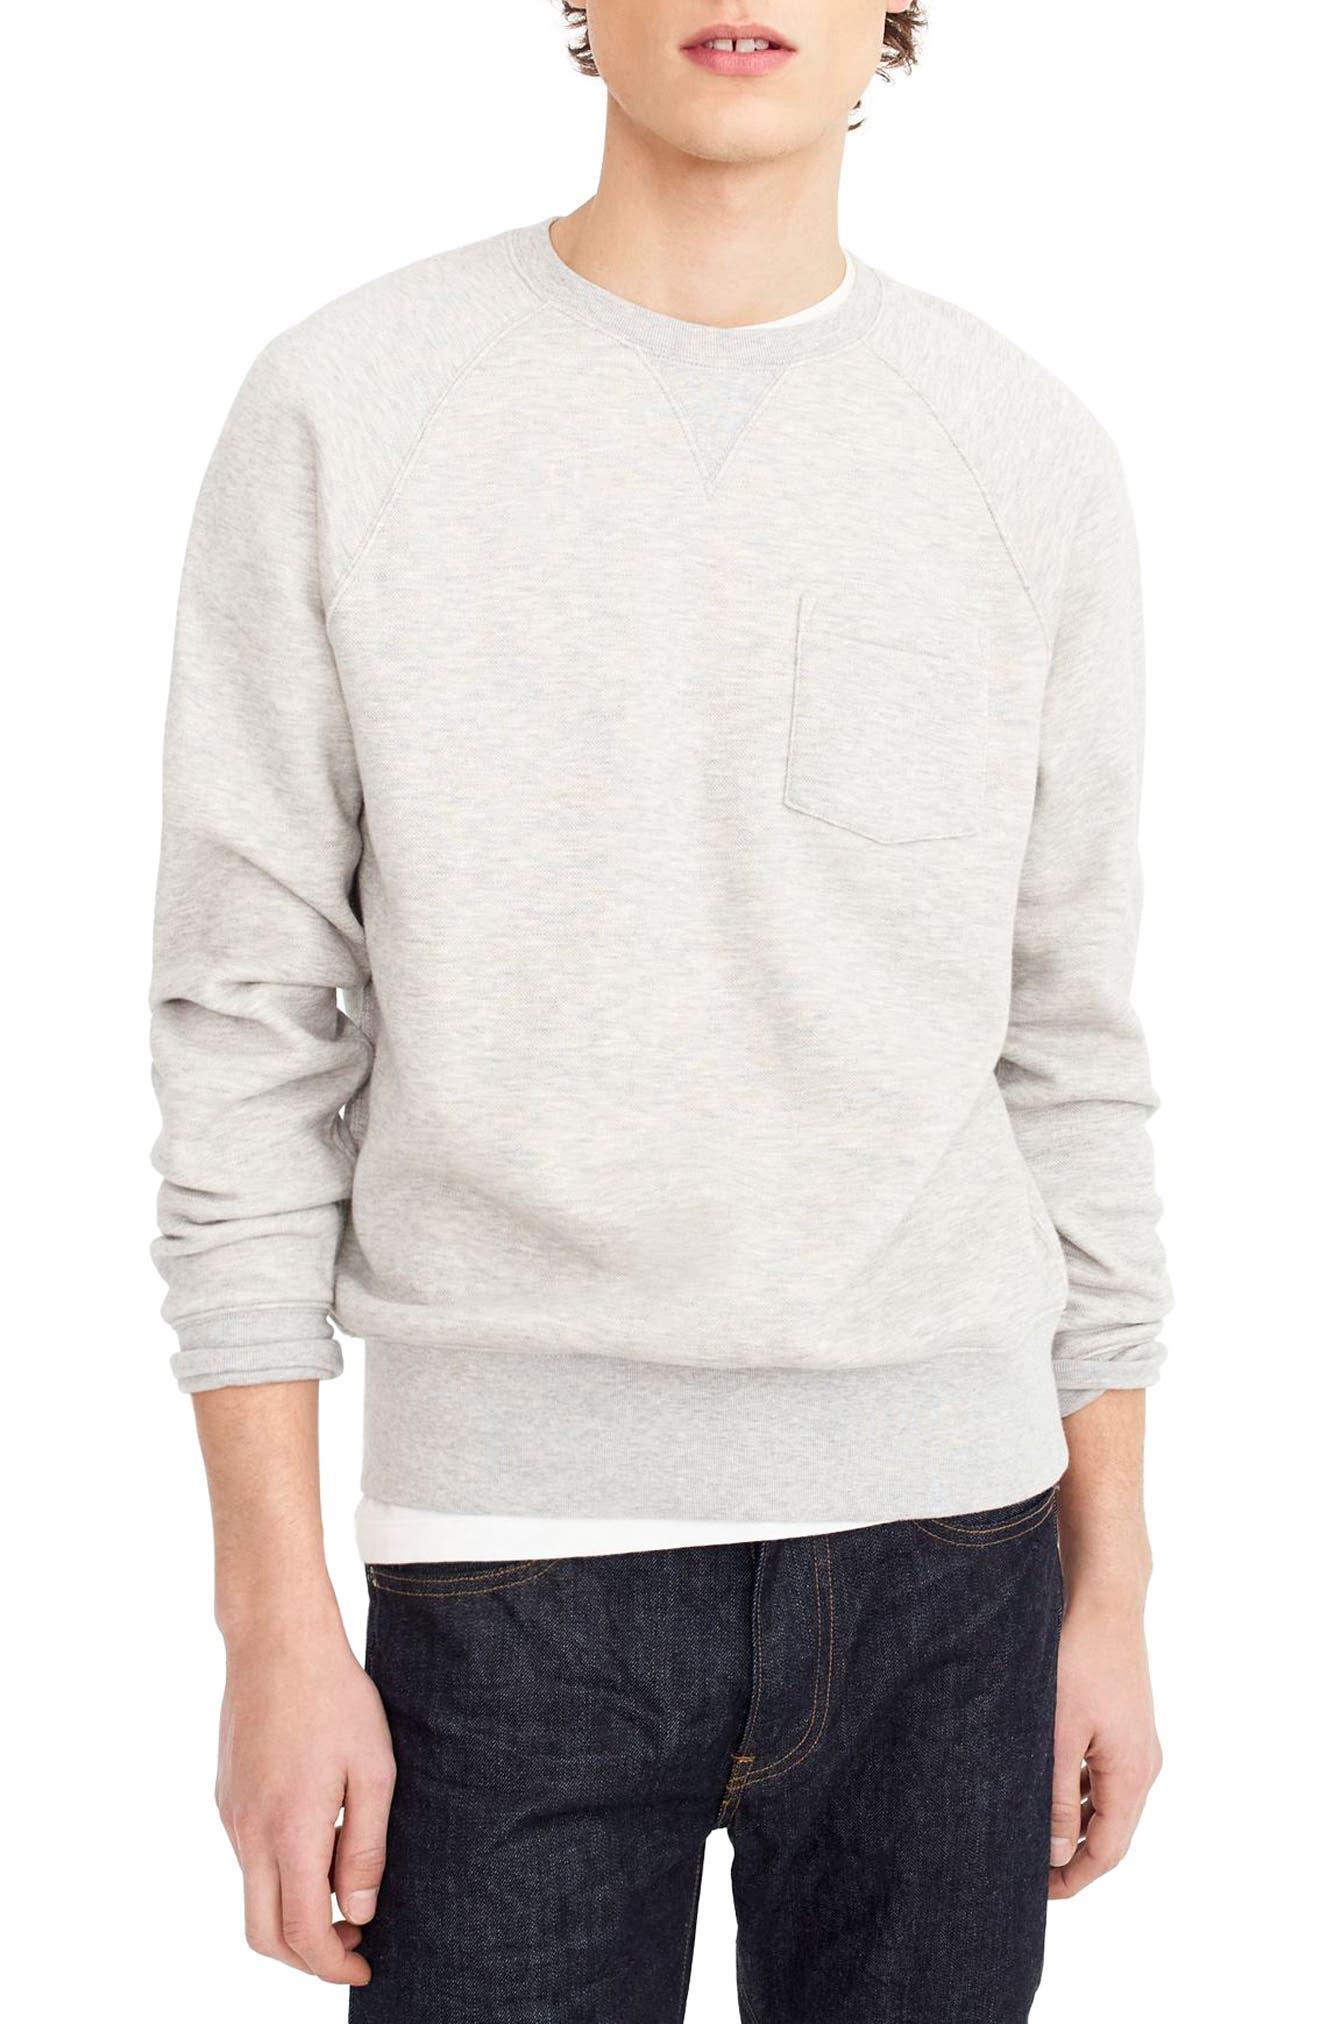 Textured Piqué Fleece Sweatshirt,                             Main thumbnail 1, color,                             020